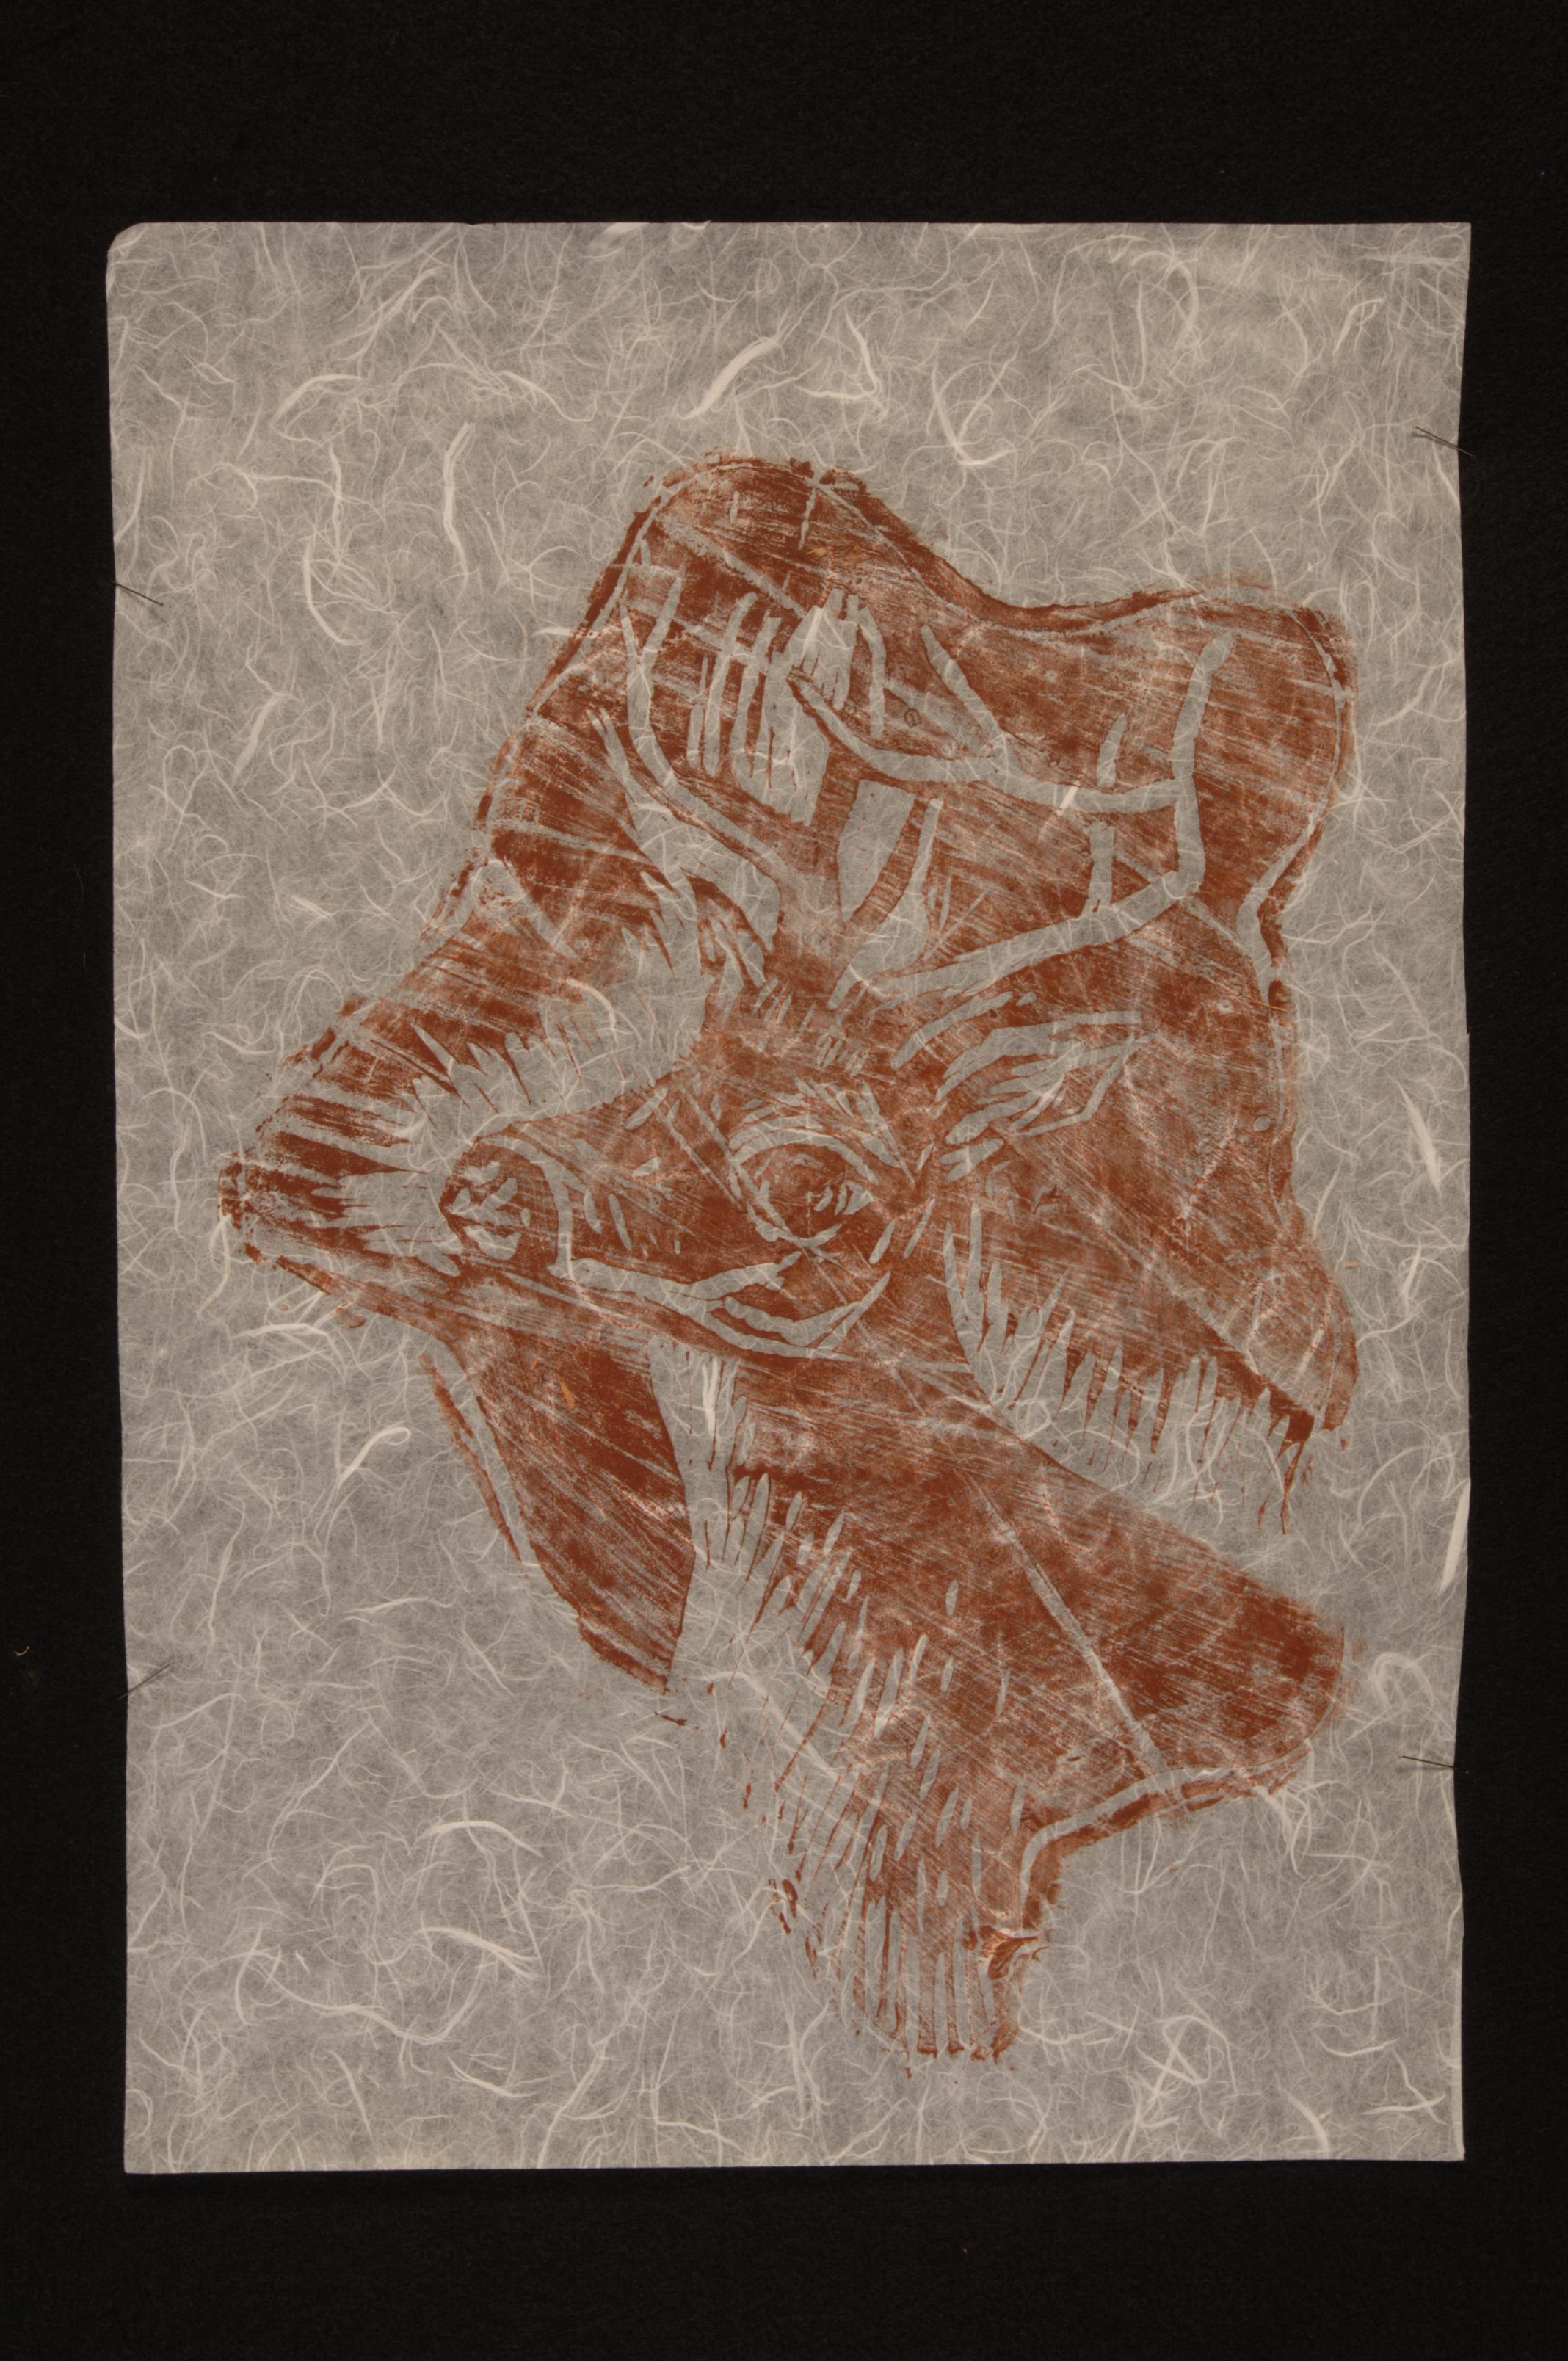 ELM tree stump (woodcut) 18 x 12